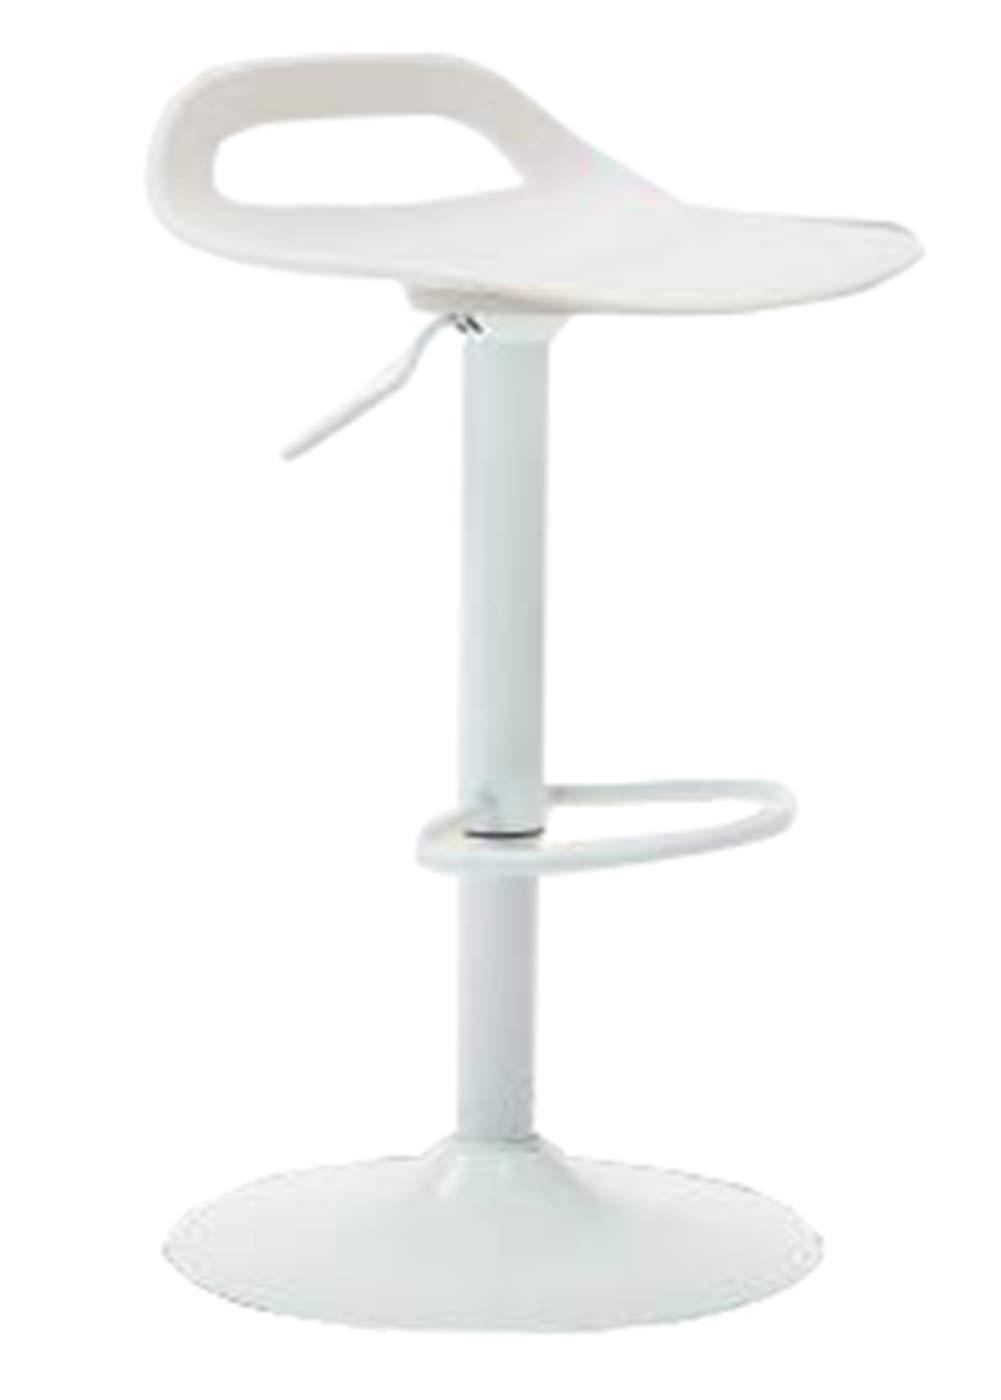 A Large Bar Lift redate Stools Chair, Beauty Salon Hairdressing Manicure Bar Stool Chair, Lifting redate Chair Stool, 360 Degree redation Ergonomic Bar Lift redate Stool Chair-E-L